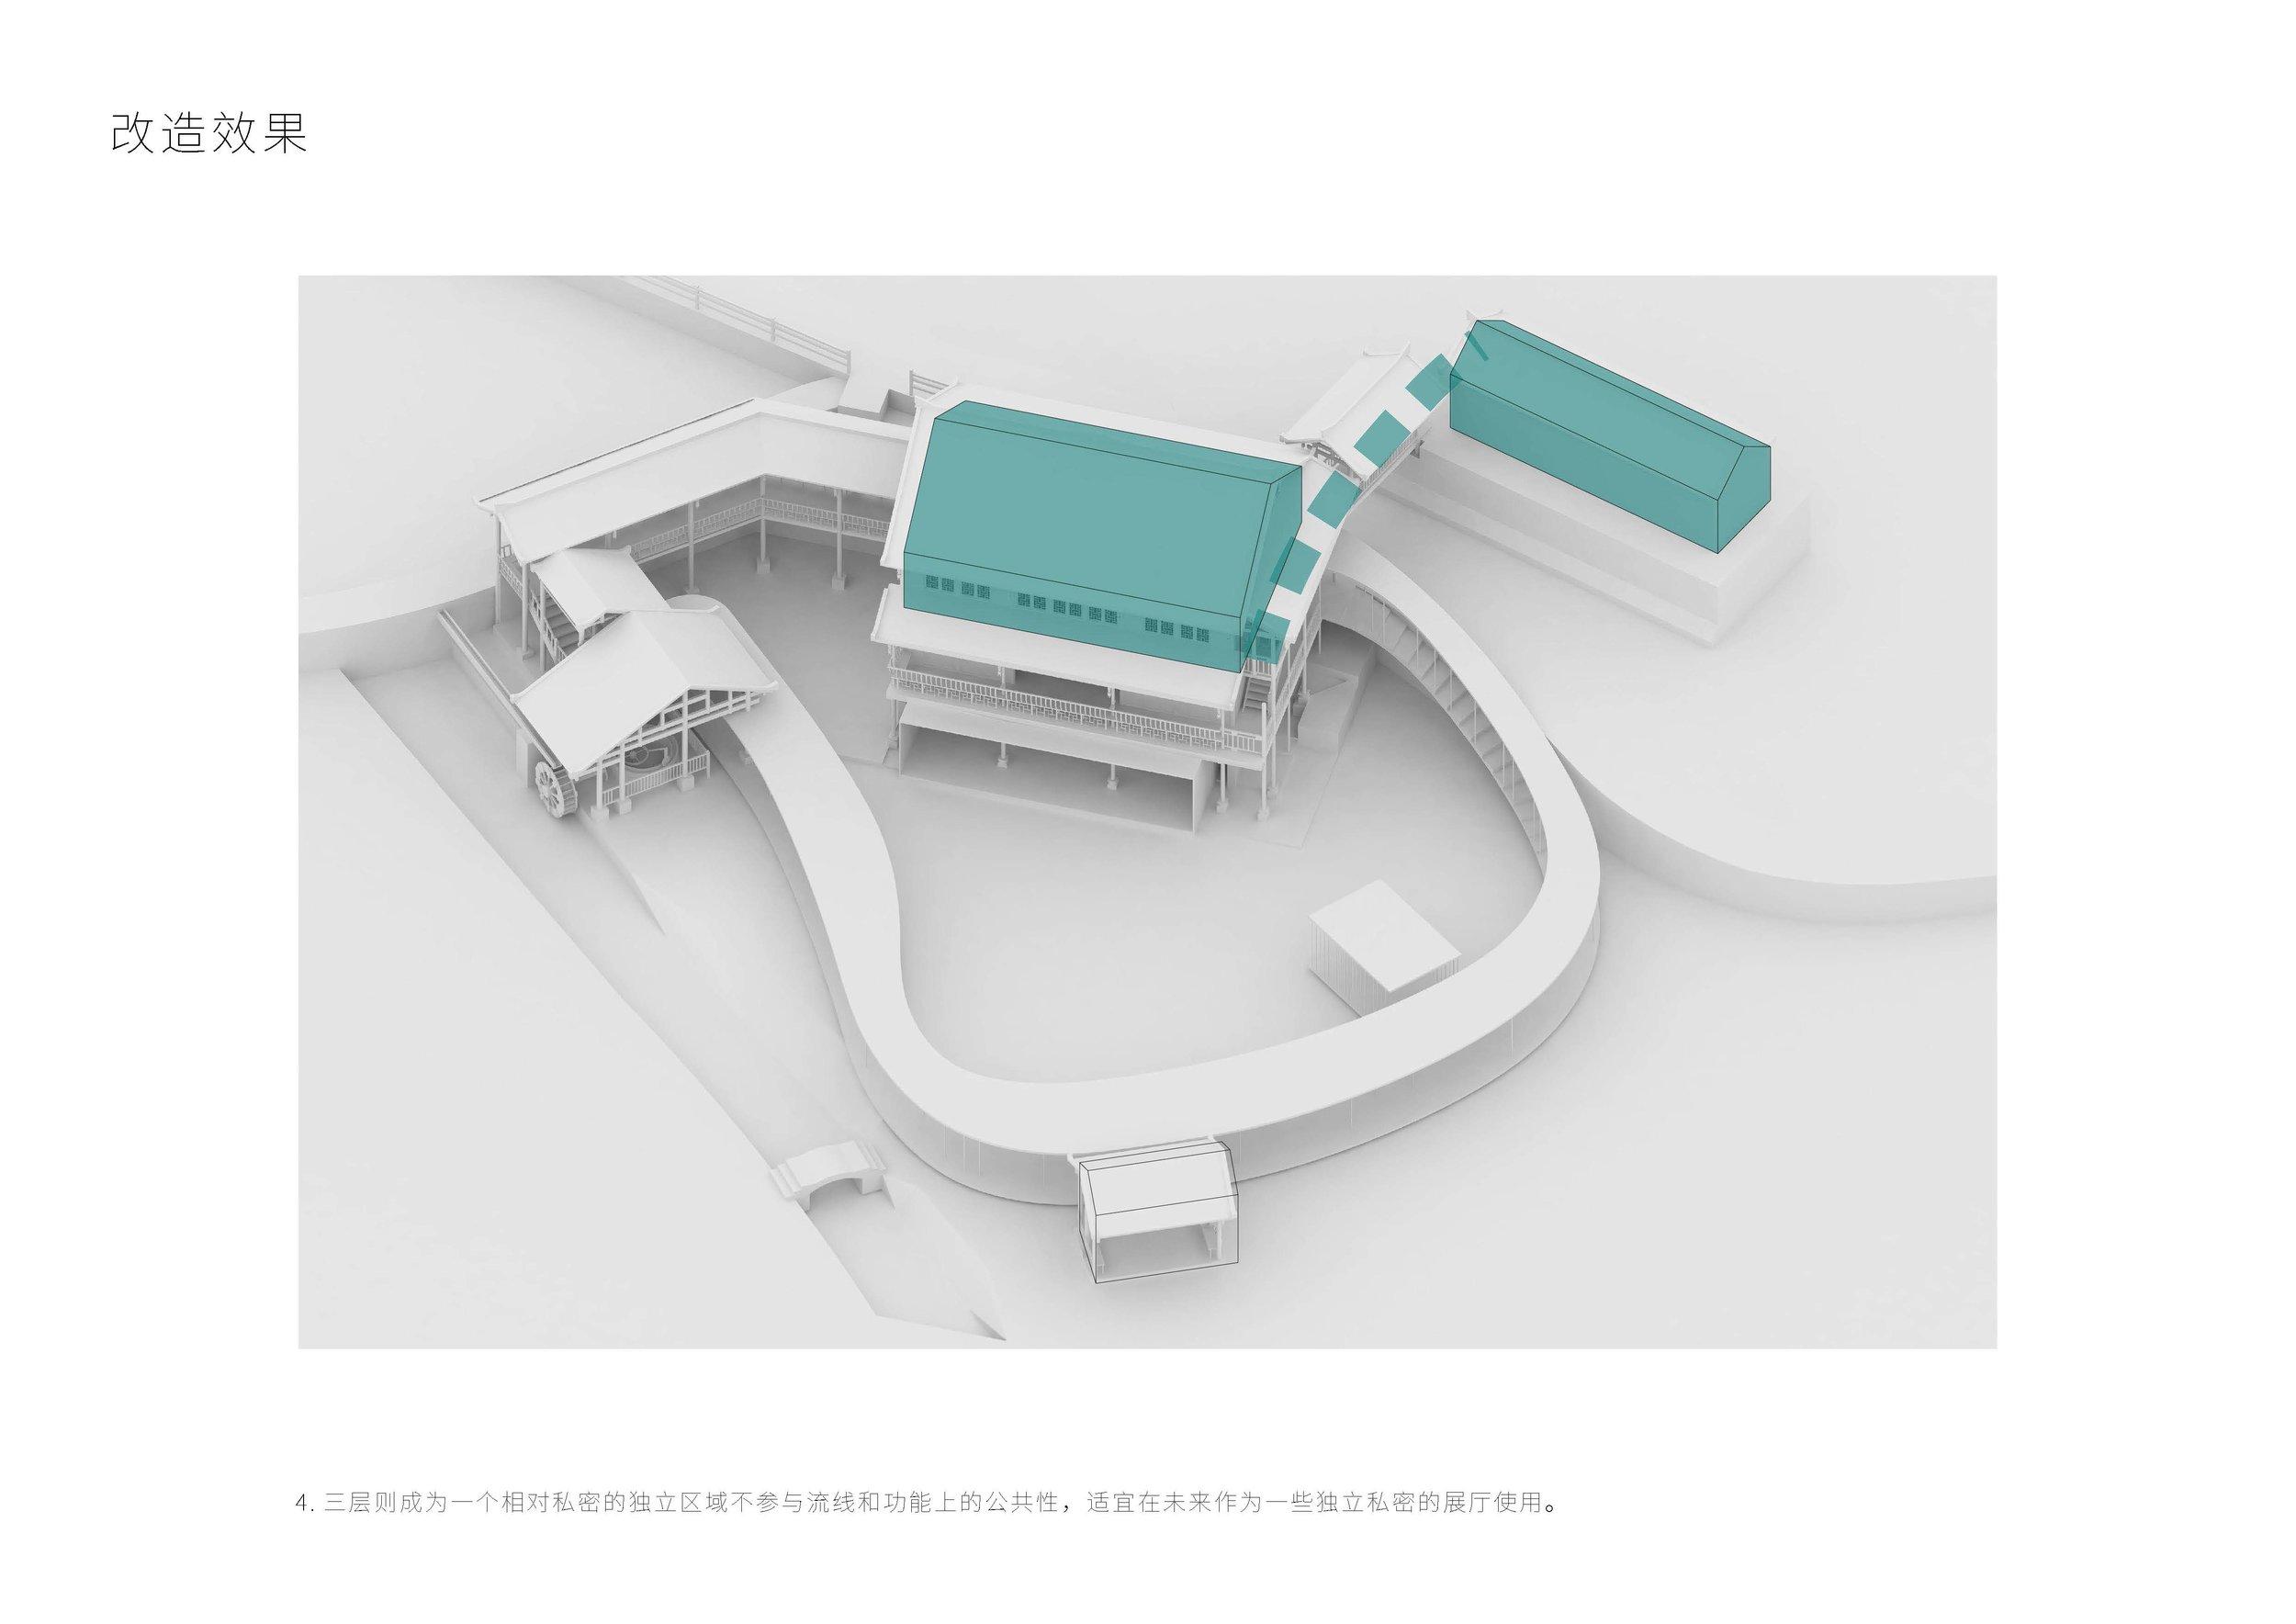 museum diagram_页面_10.jpg